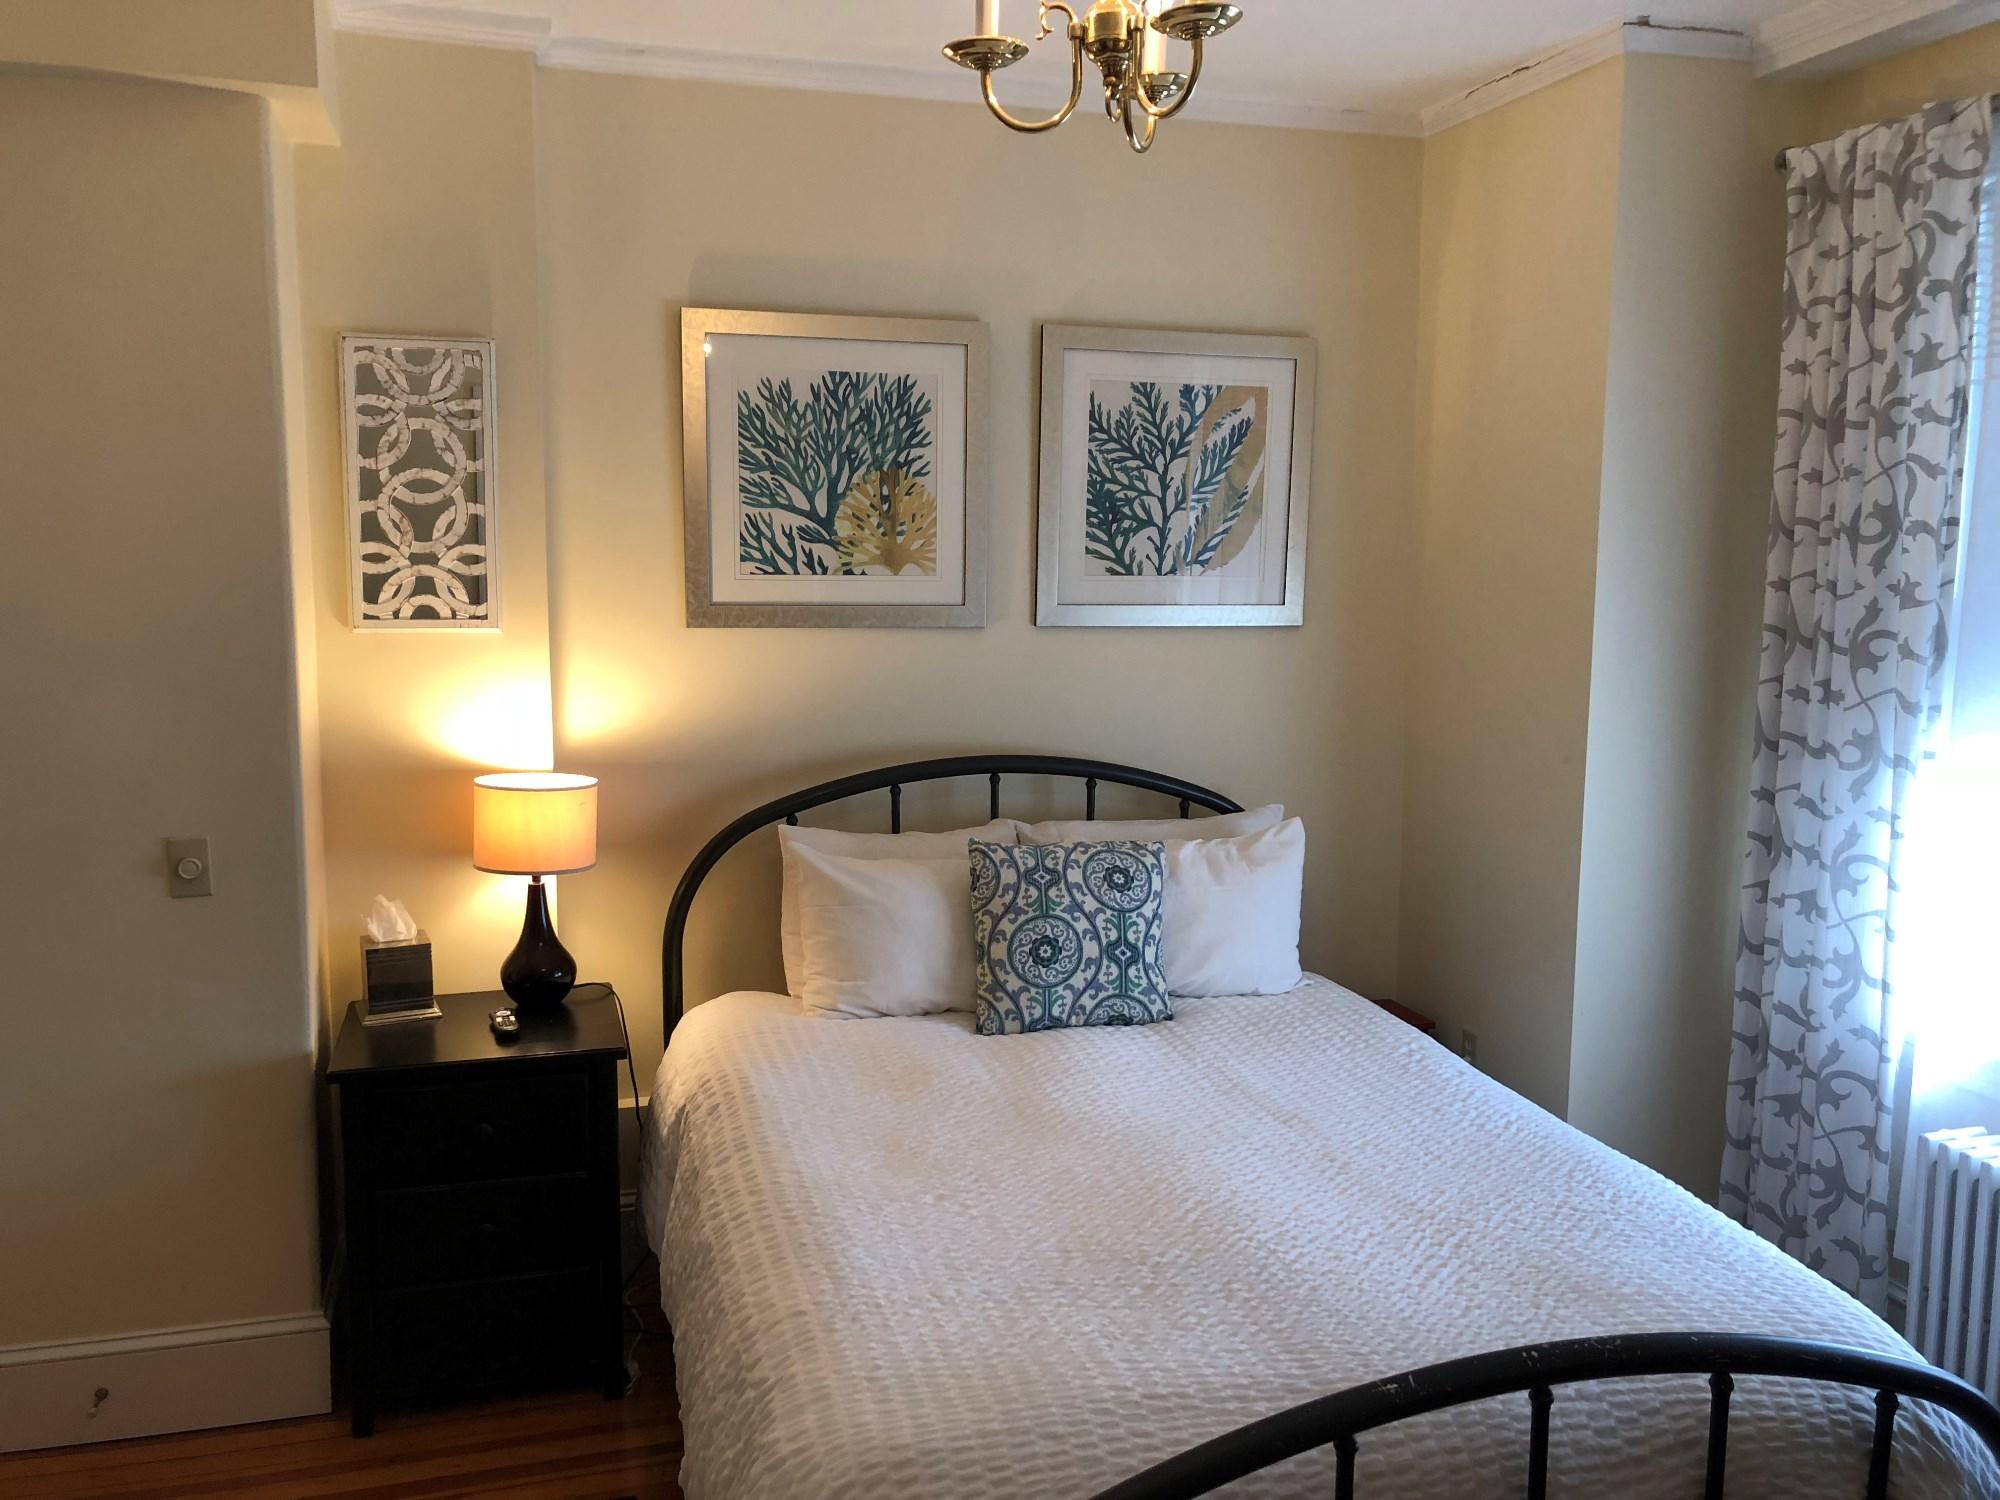 newport blues inn accommodations room 7. Black Bedroom Furniture Sets. Home Design Ideas